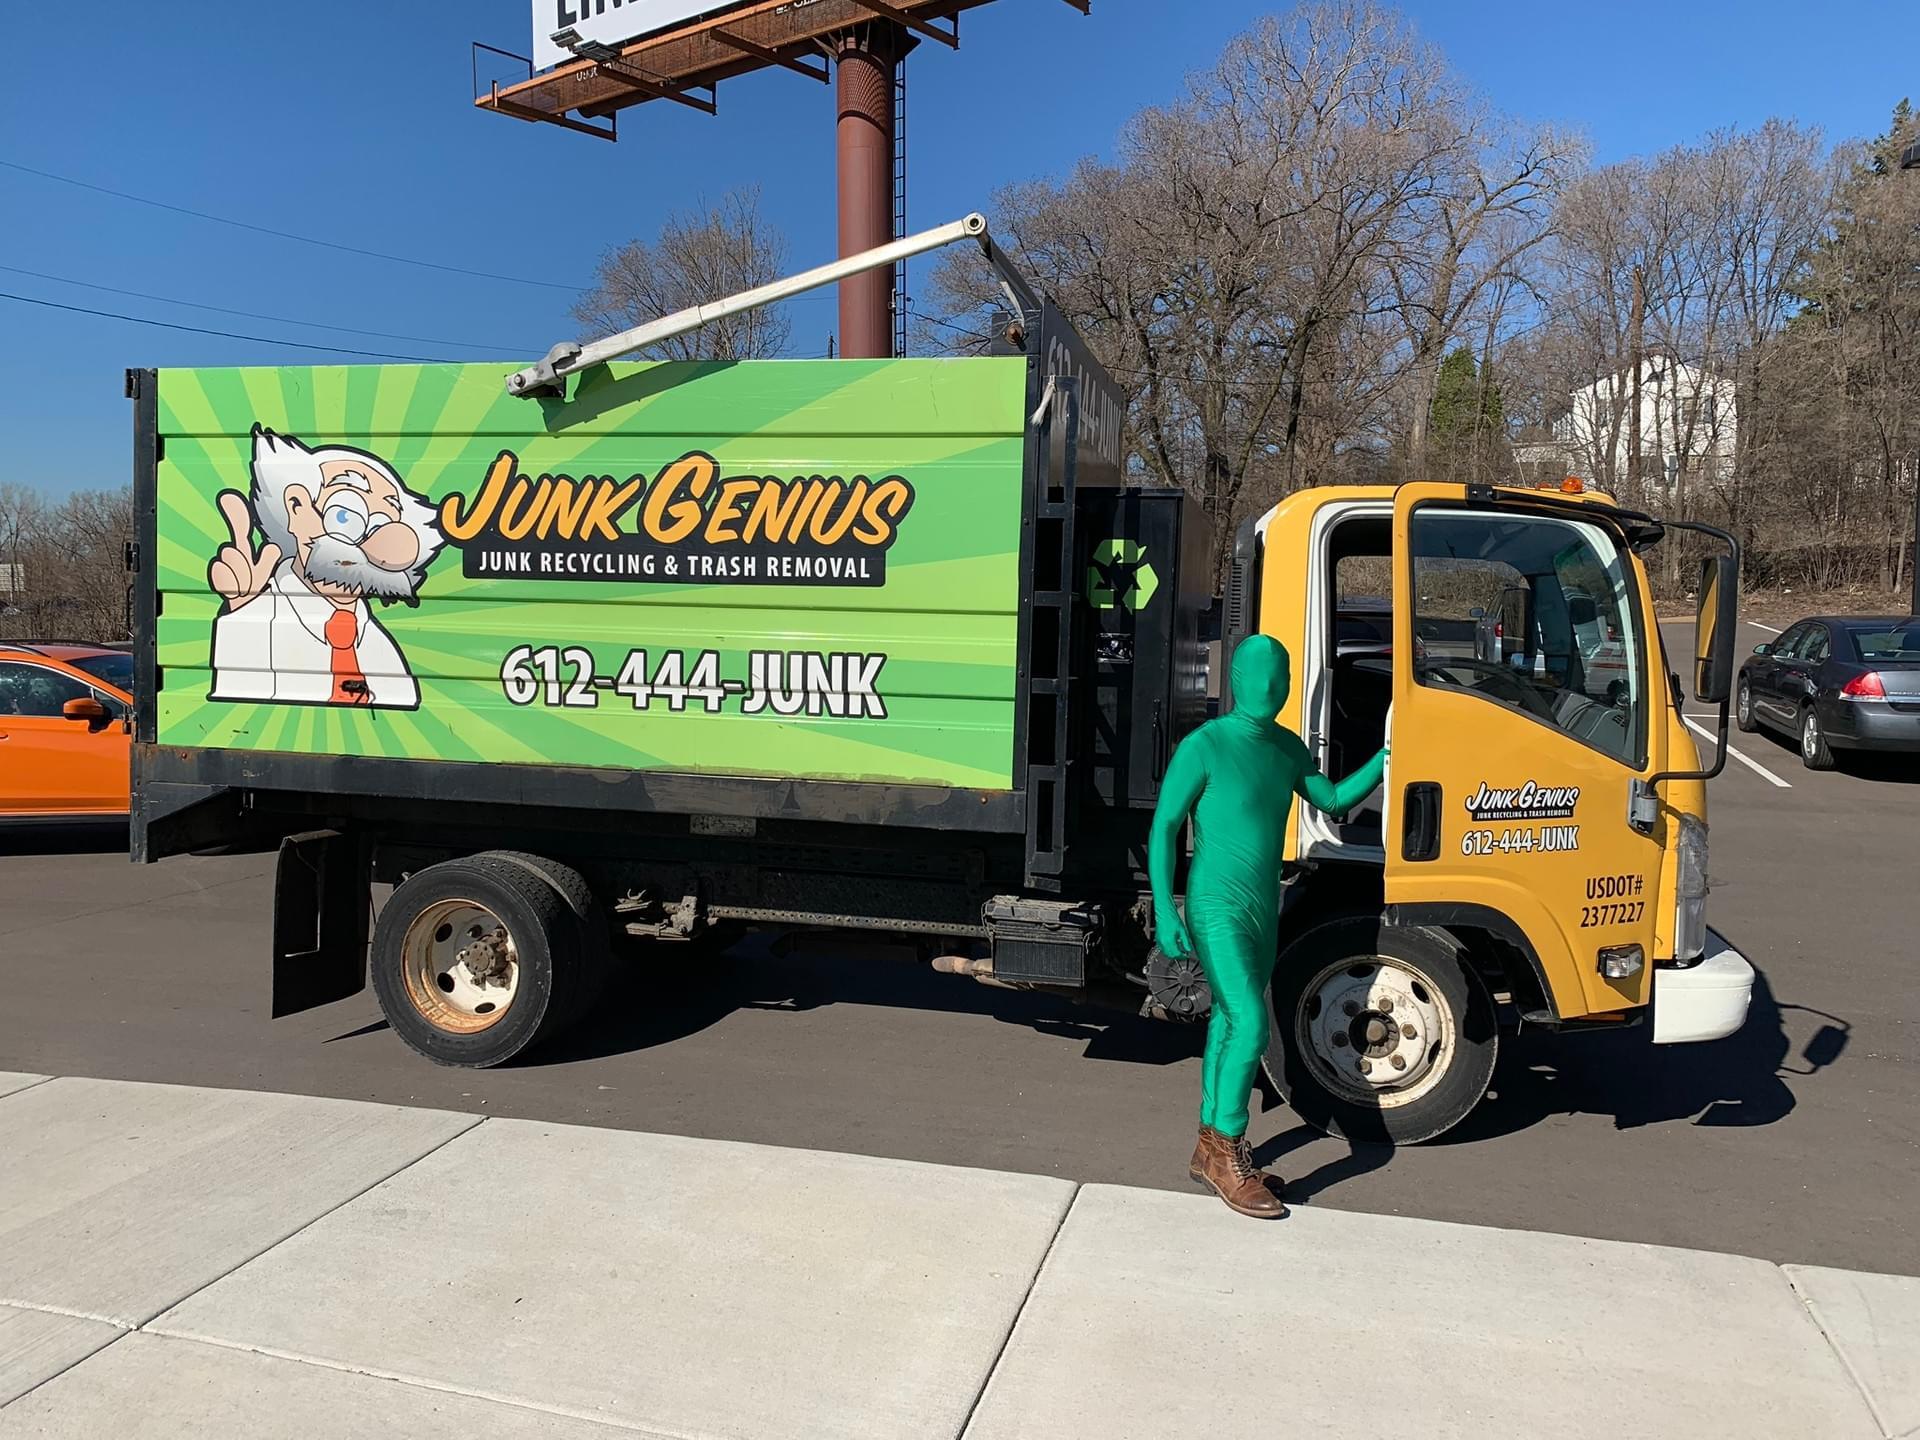 Twin Cities - Junk Genius Junk Removal